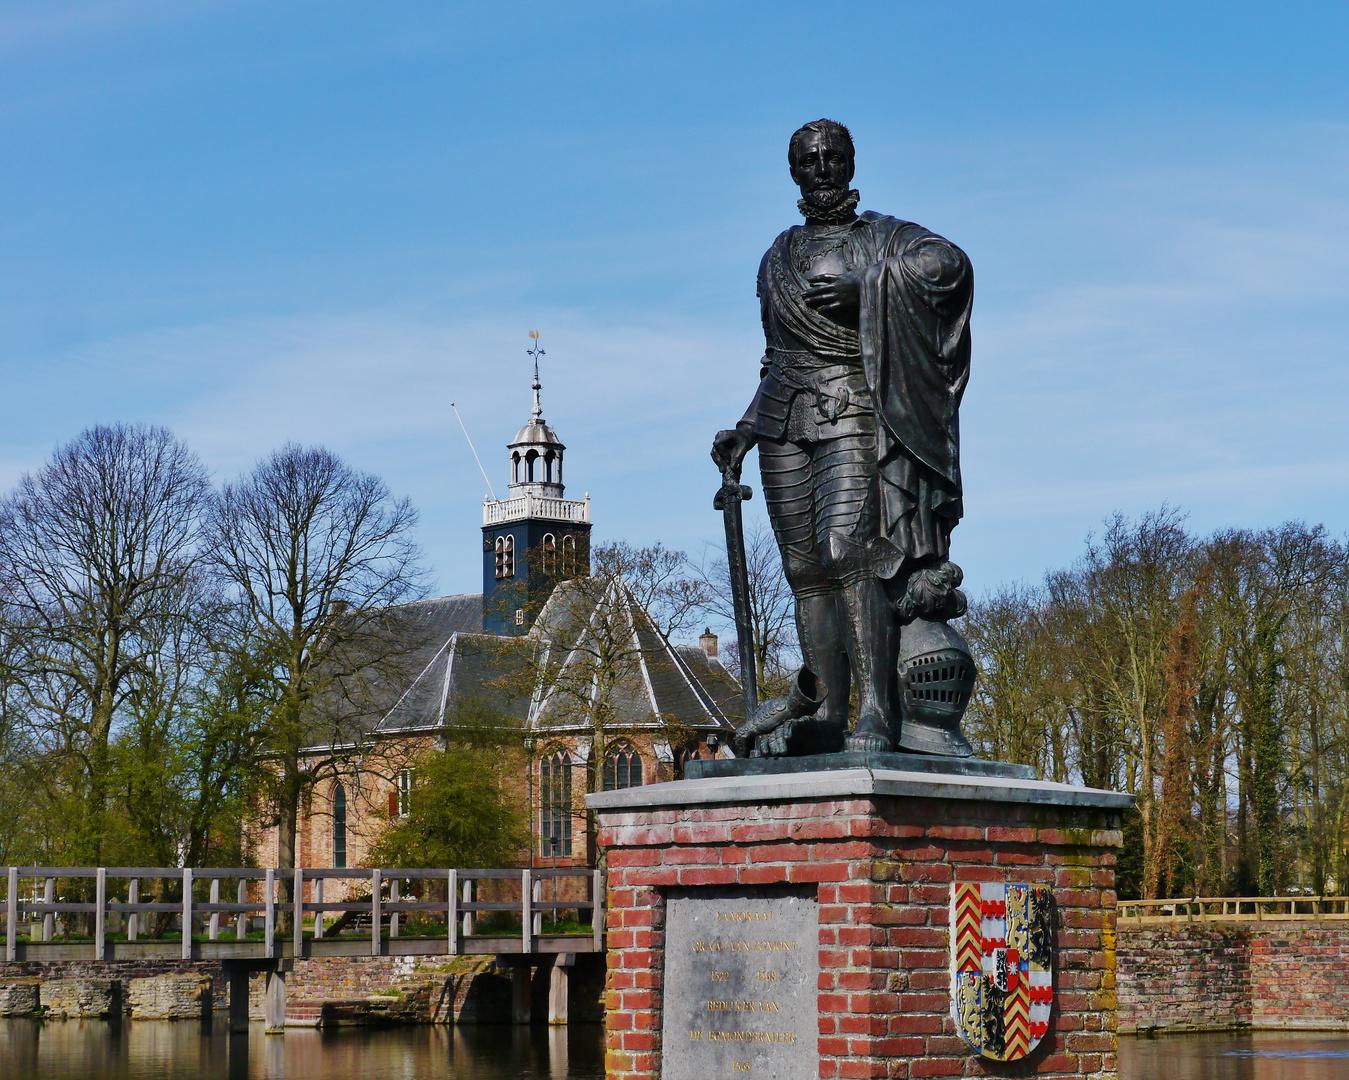 Lamoraal Graf van Egmont (1522-1568)